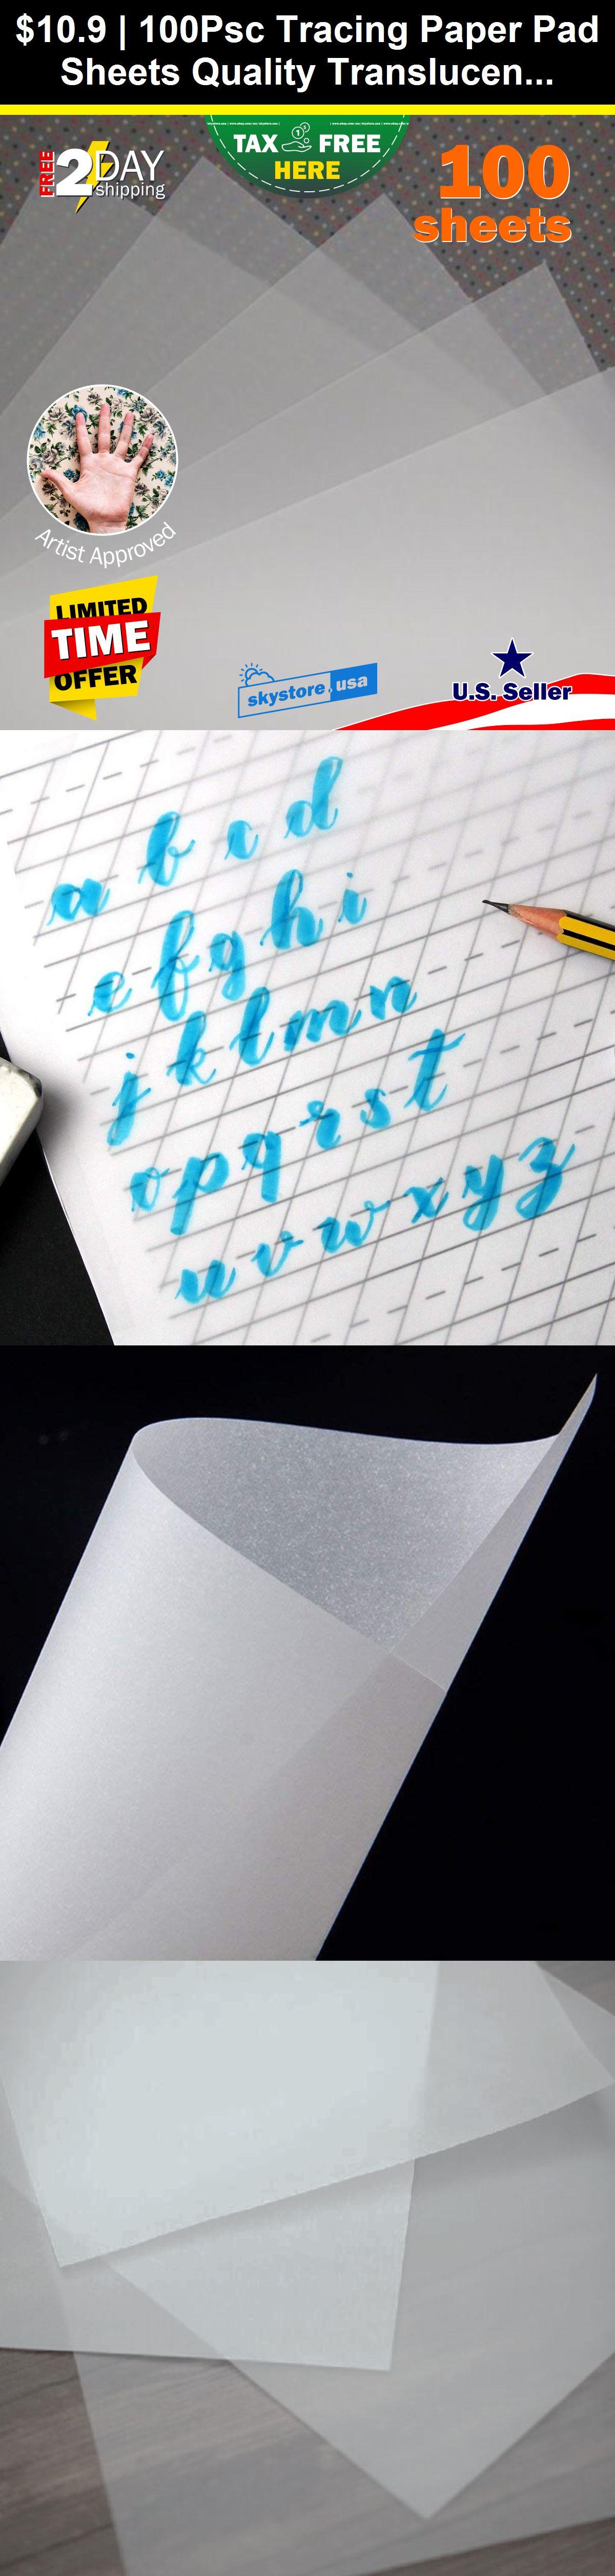 100psc tracing paper pad sheets quality translucent medium